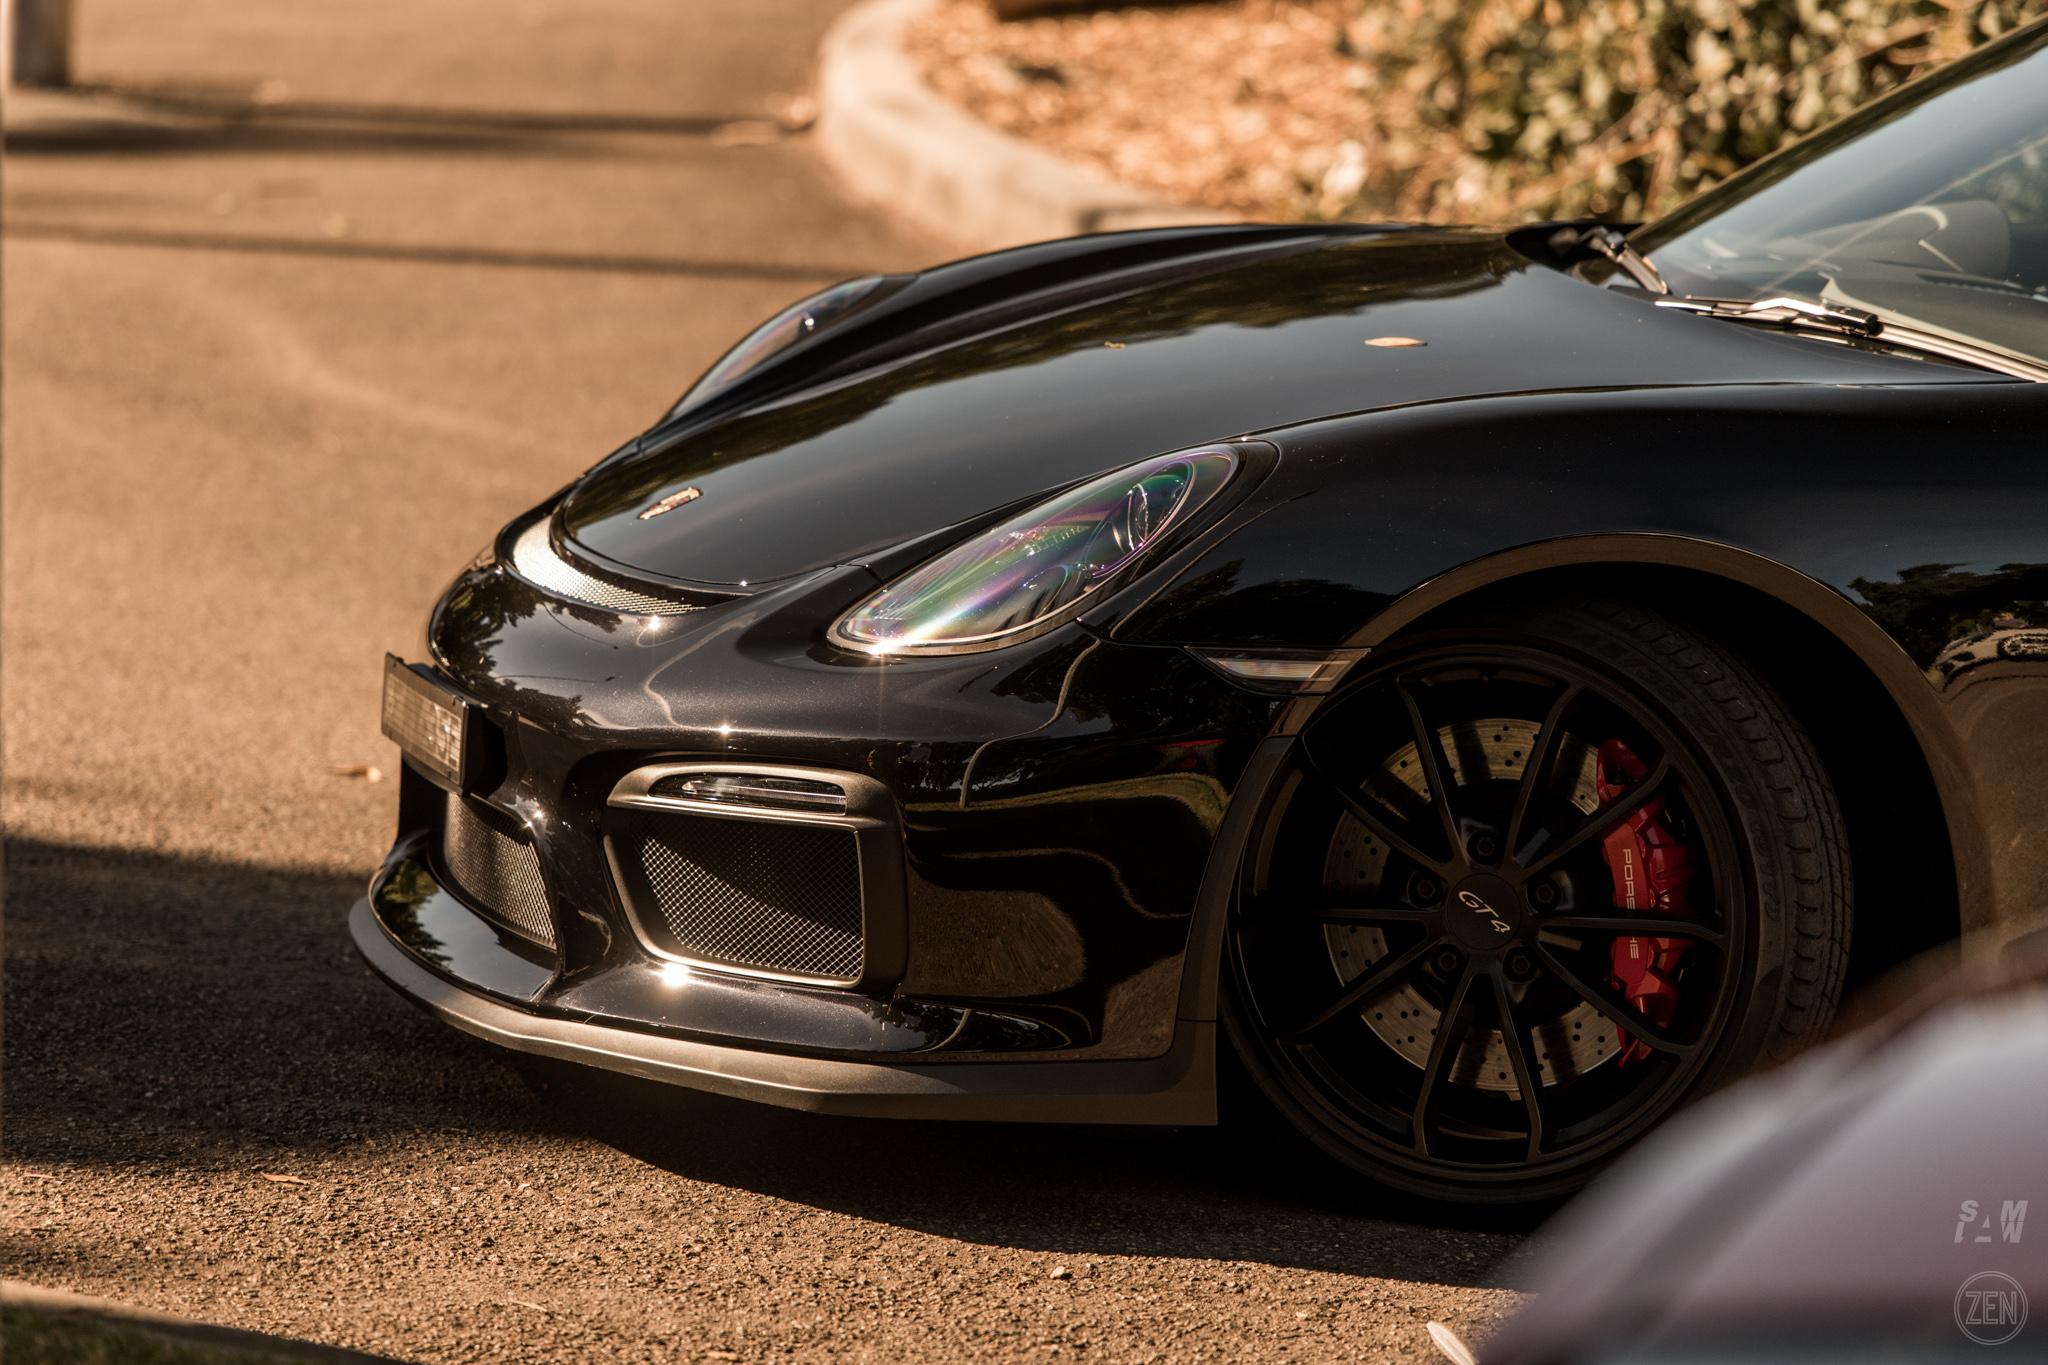 2019-10-27 - Autohaus Porsches & Coffee 142